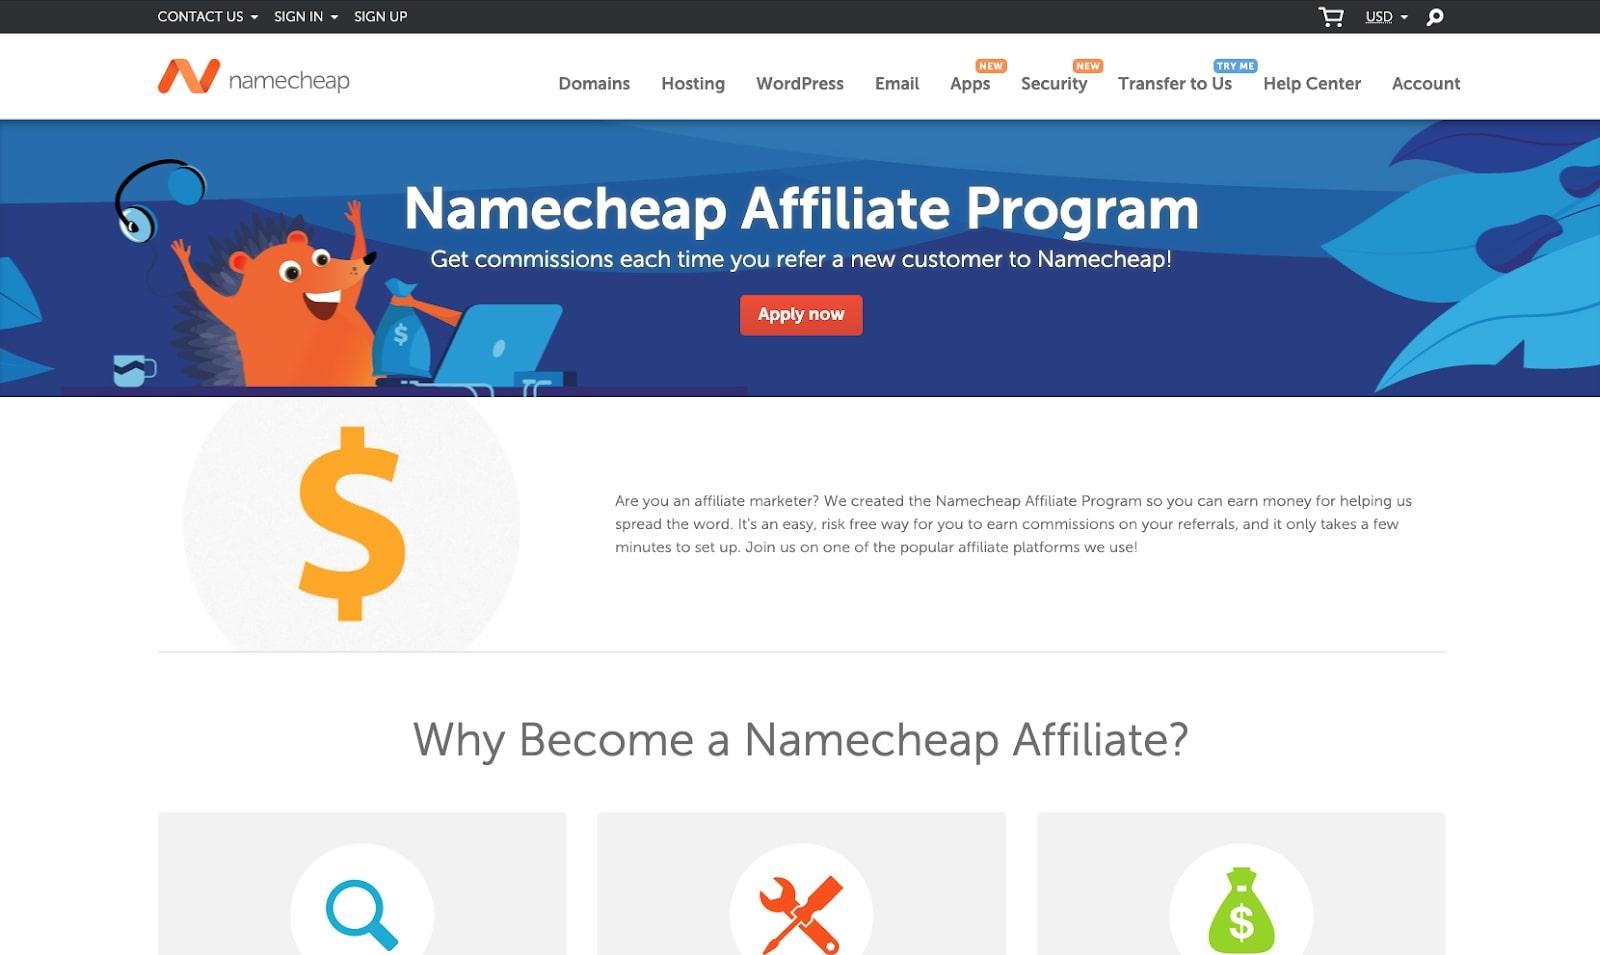 Screenshot of Namecheap affiliate program website